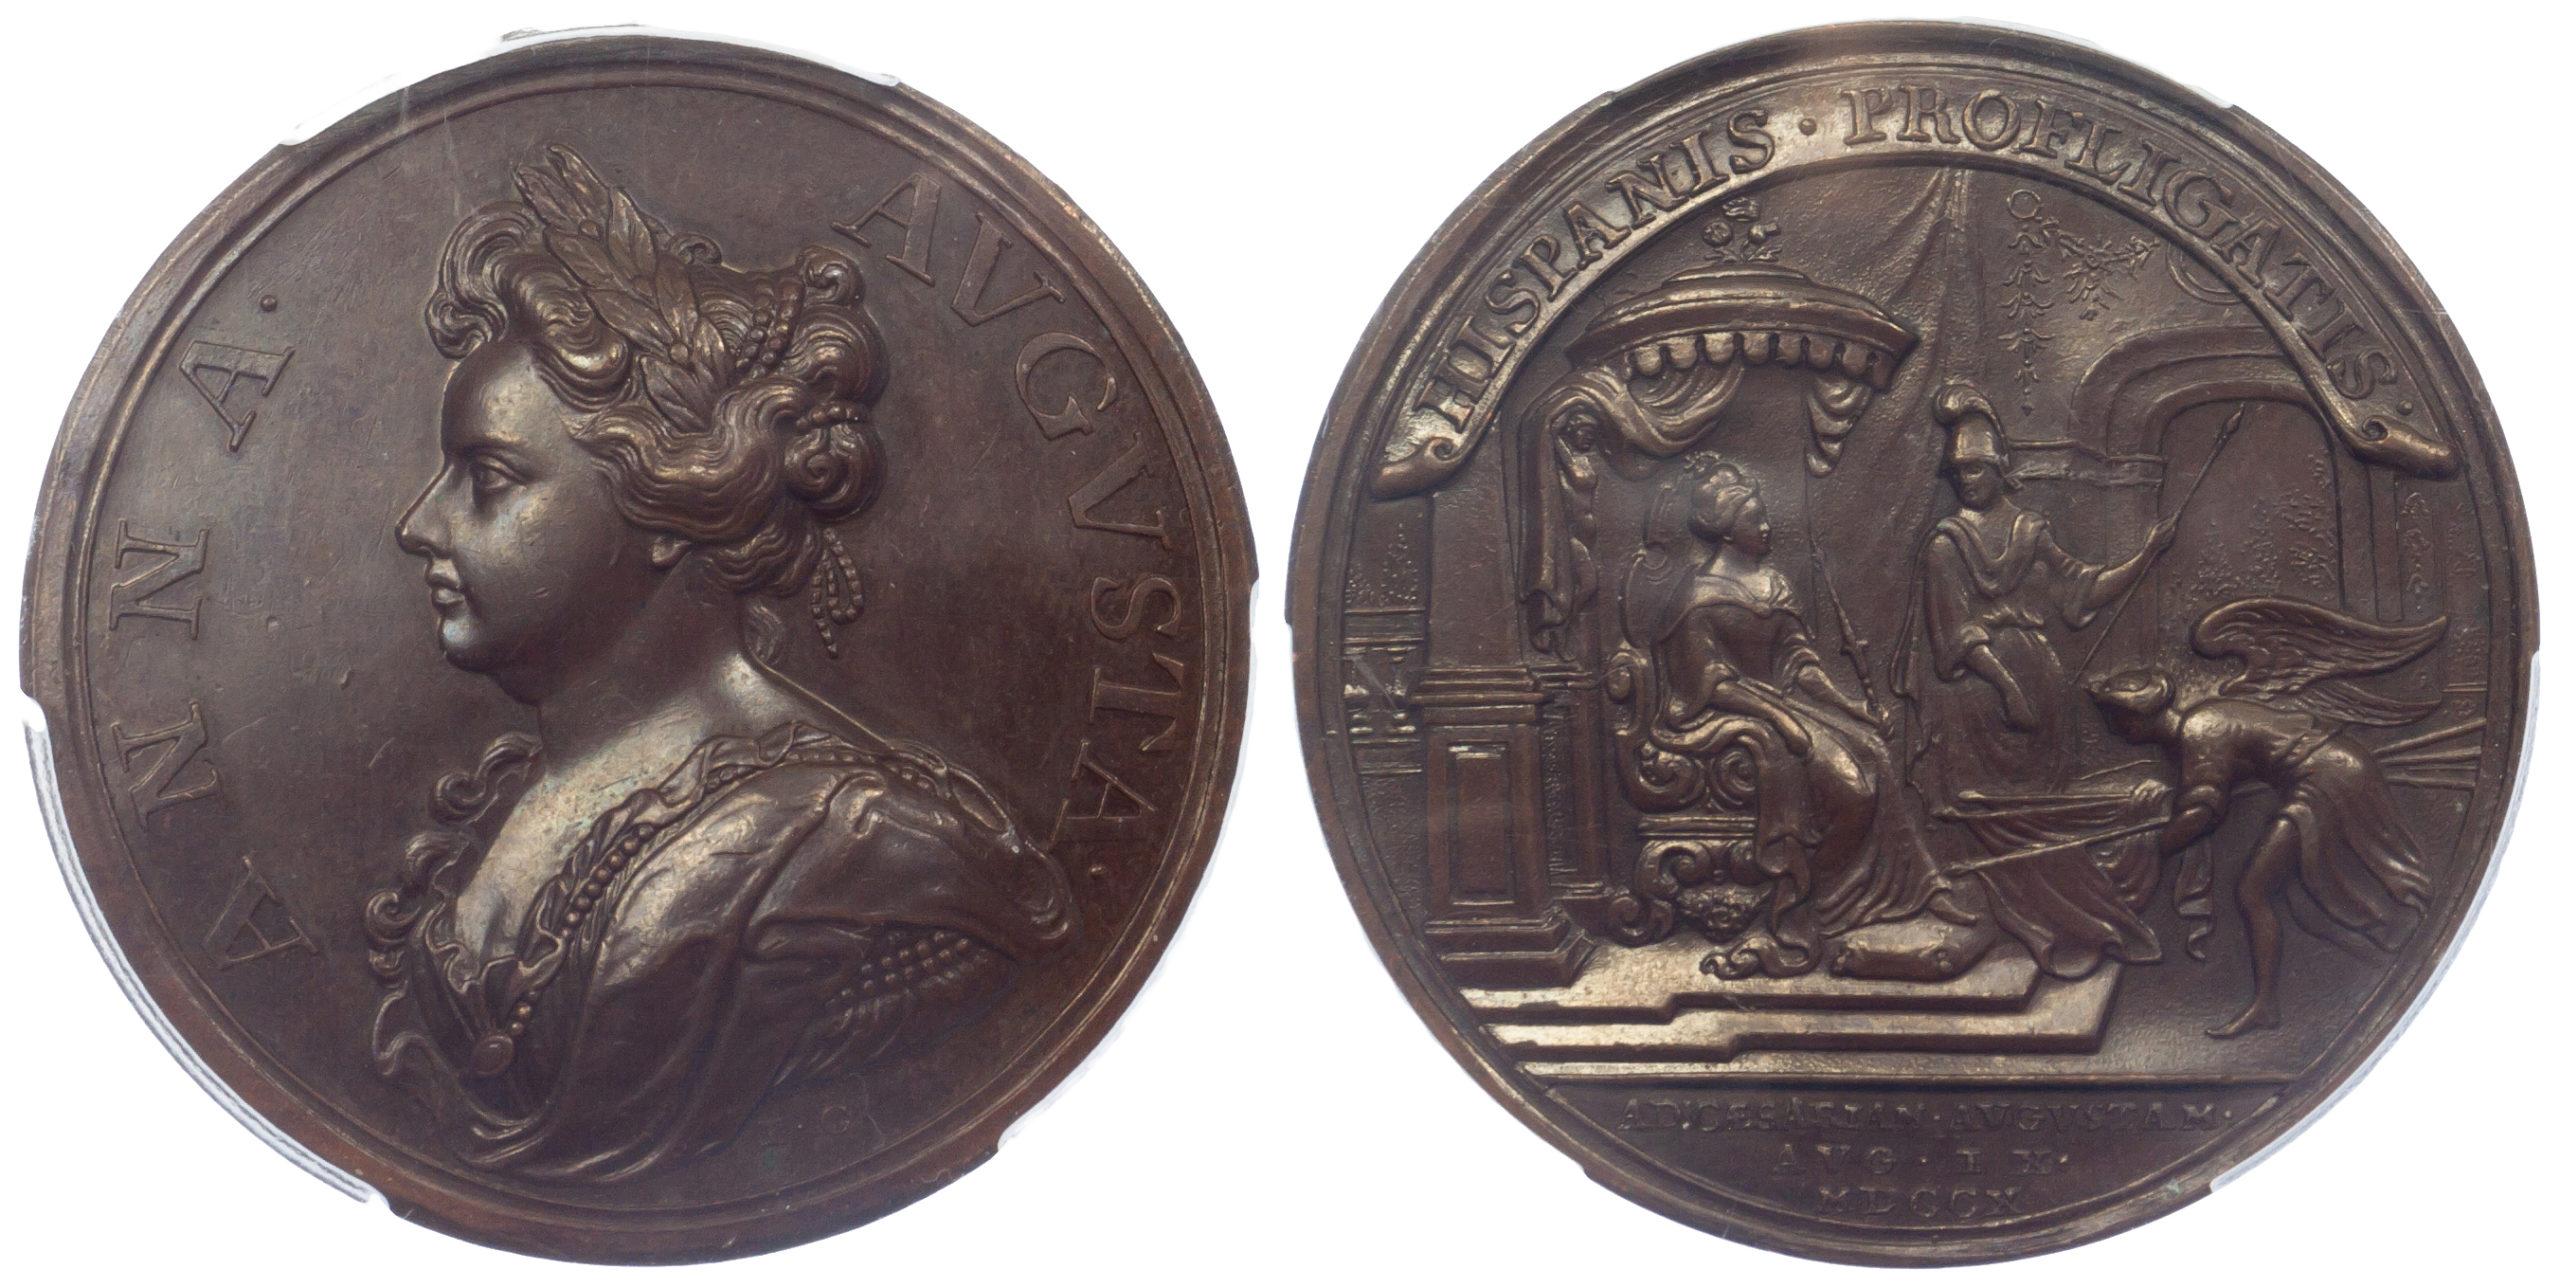 Anne, Battle of Saragossa, Medal, 1710